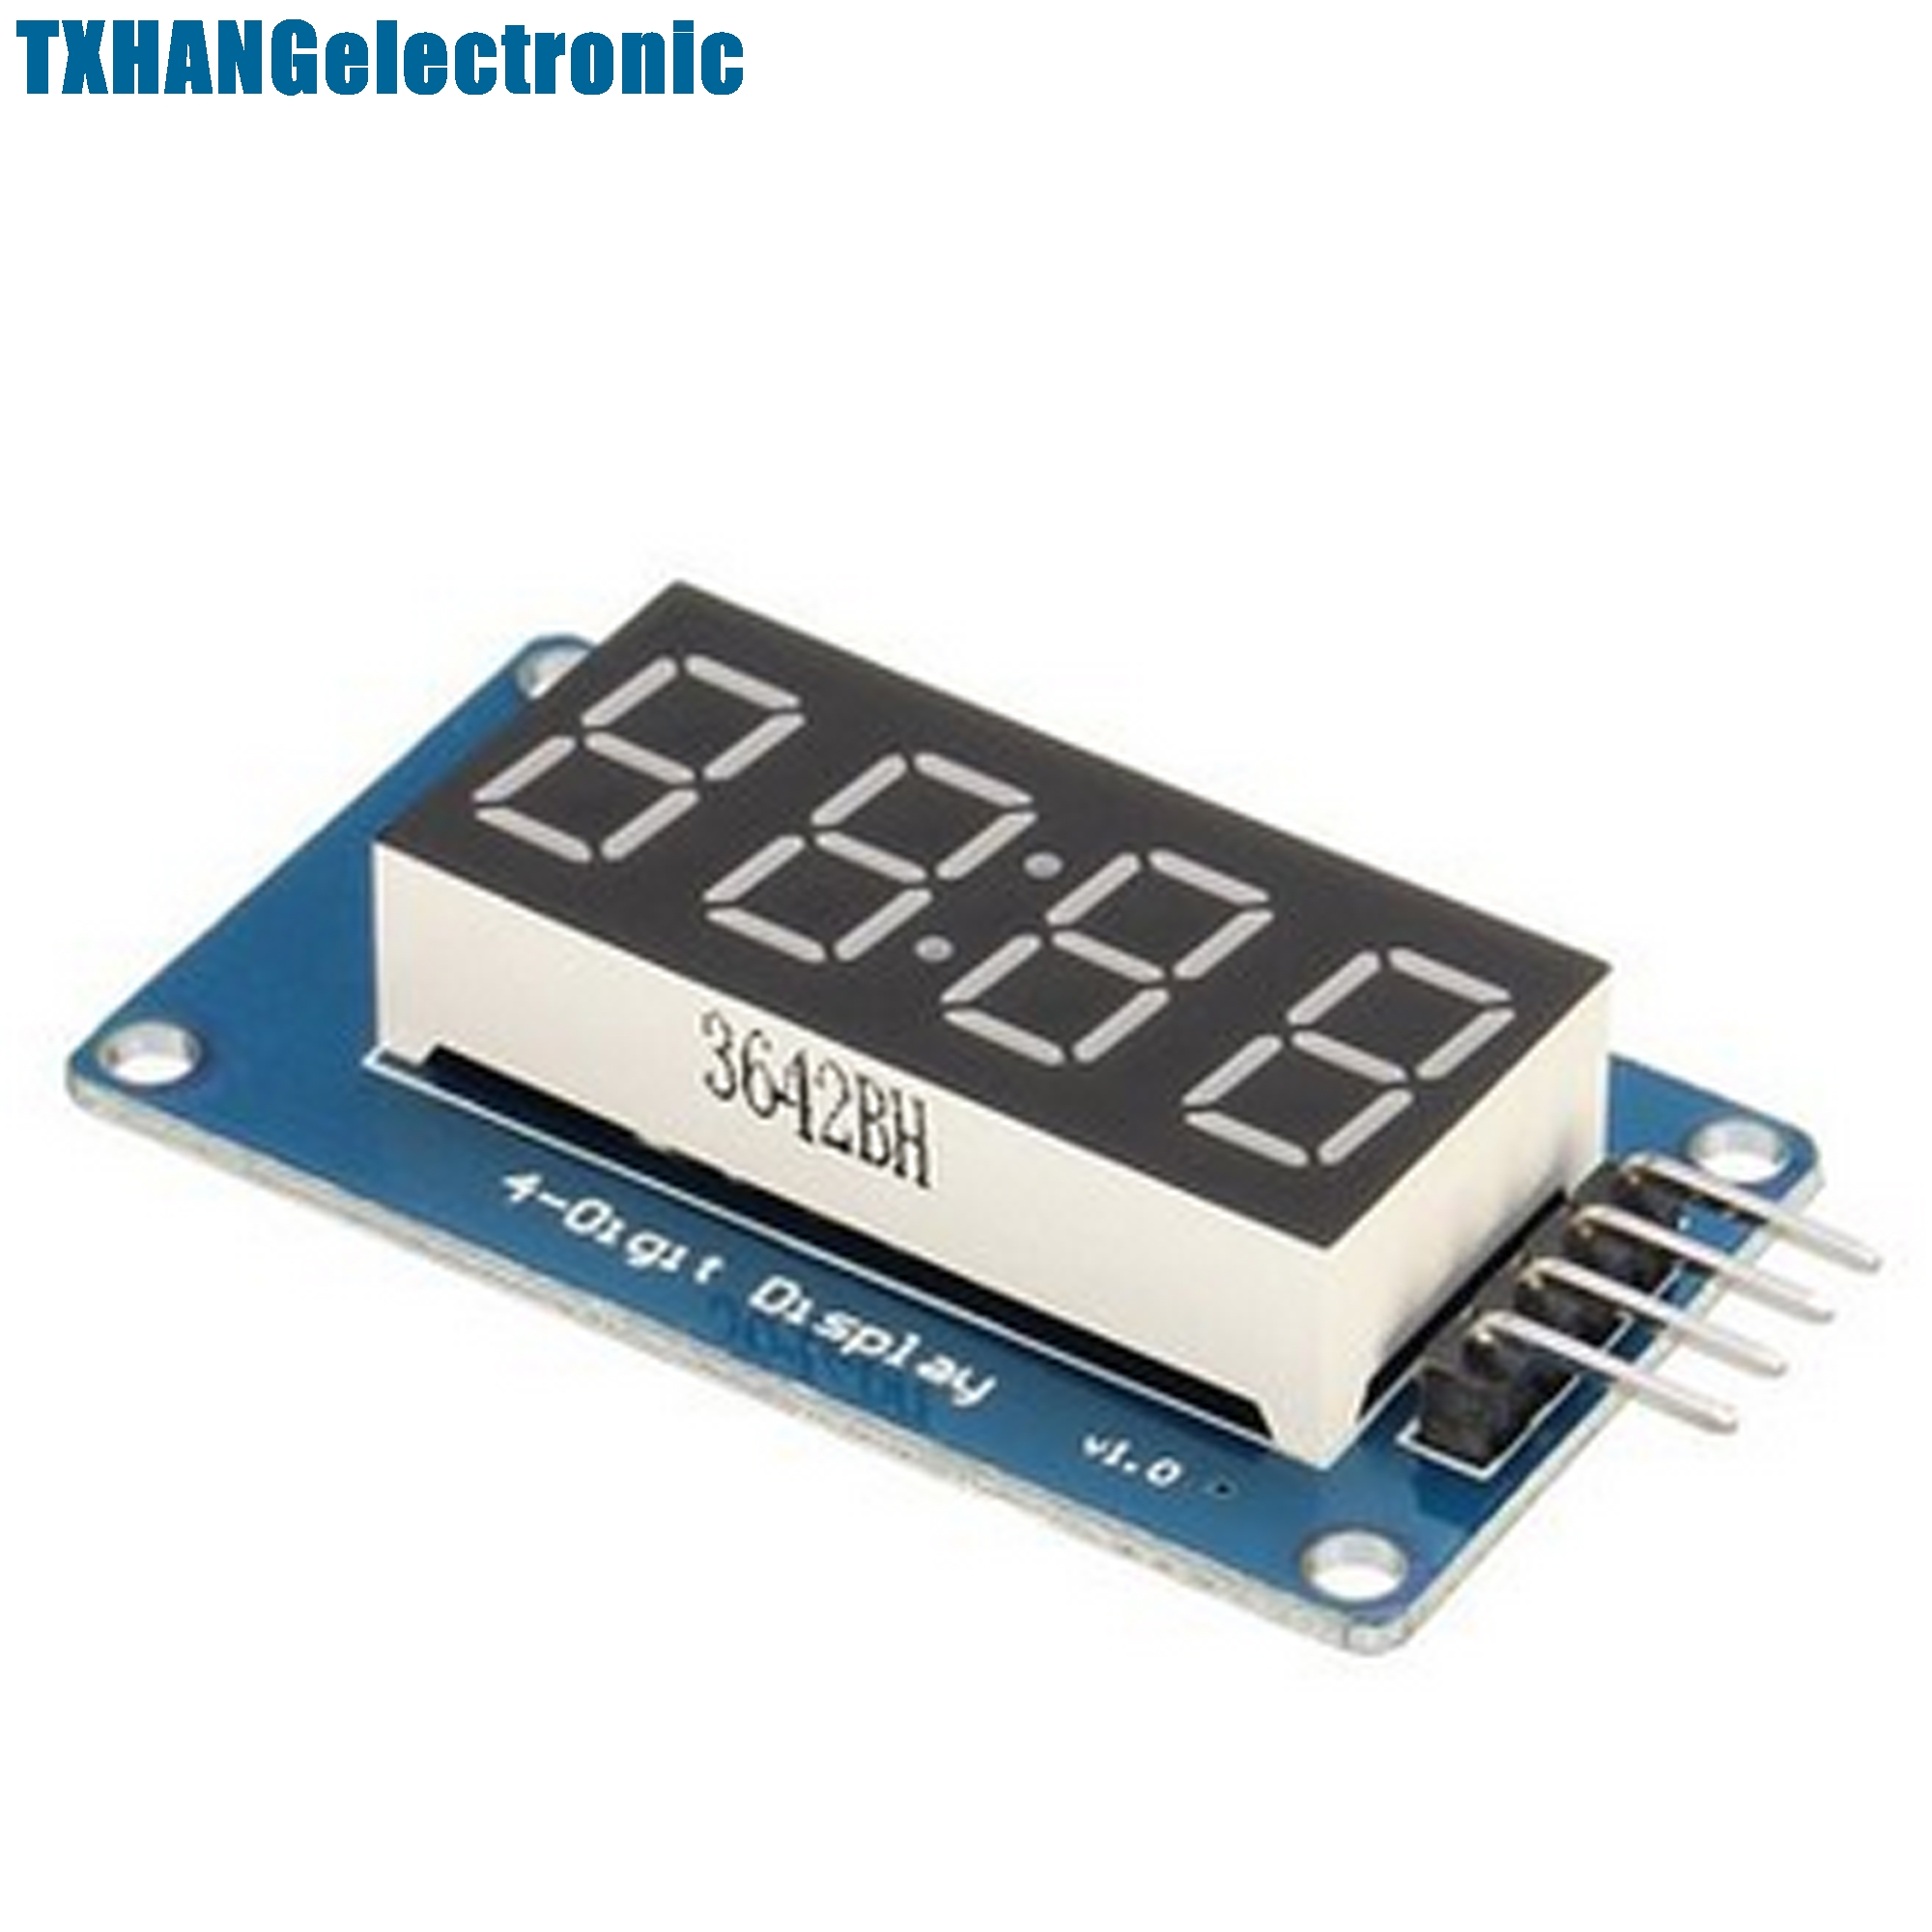 2 шт. 4 биты цифровой LED Дисплей tm1637 модуль с часами Дисплей